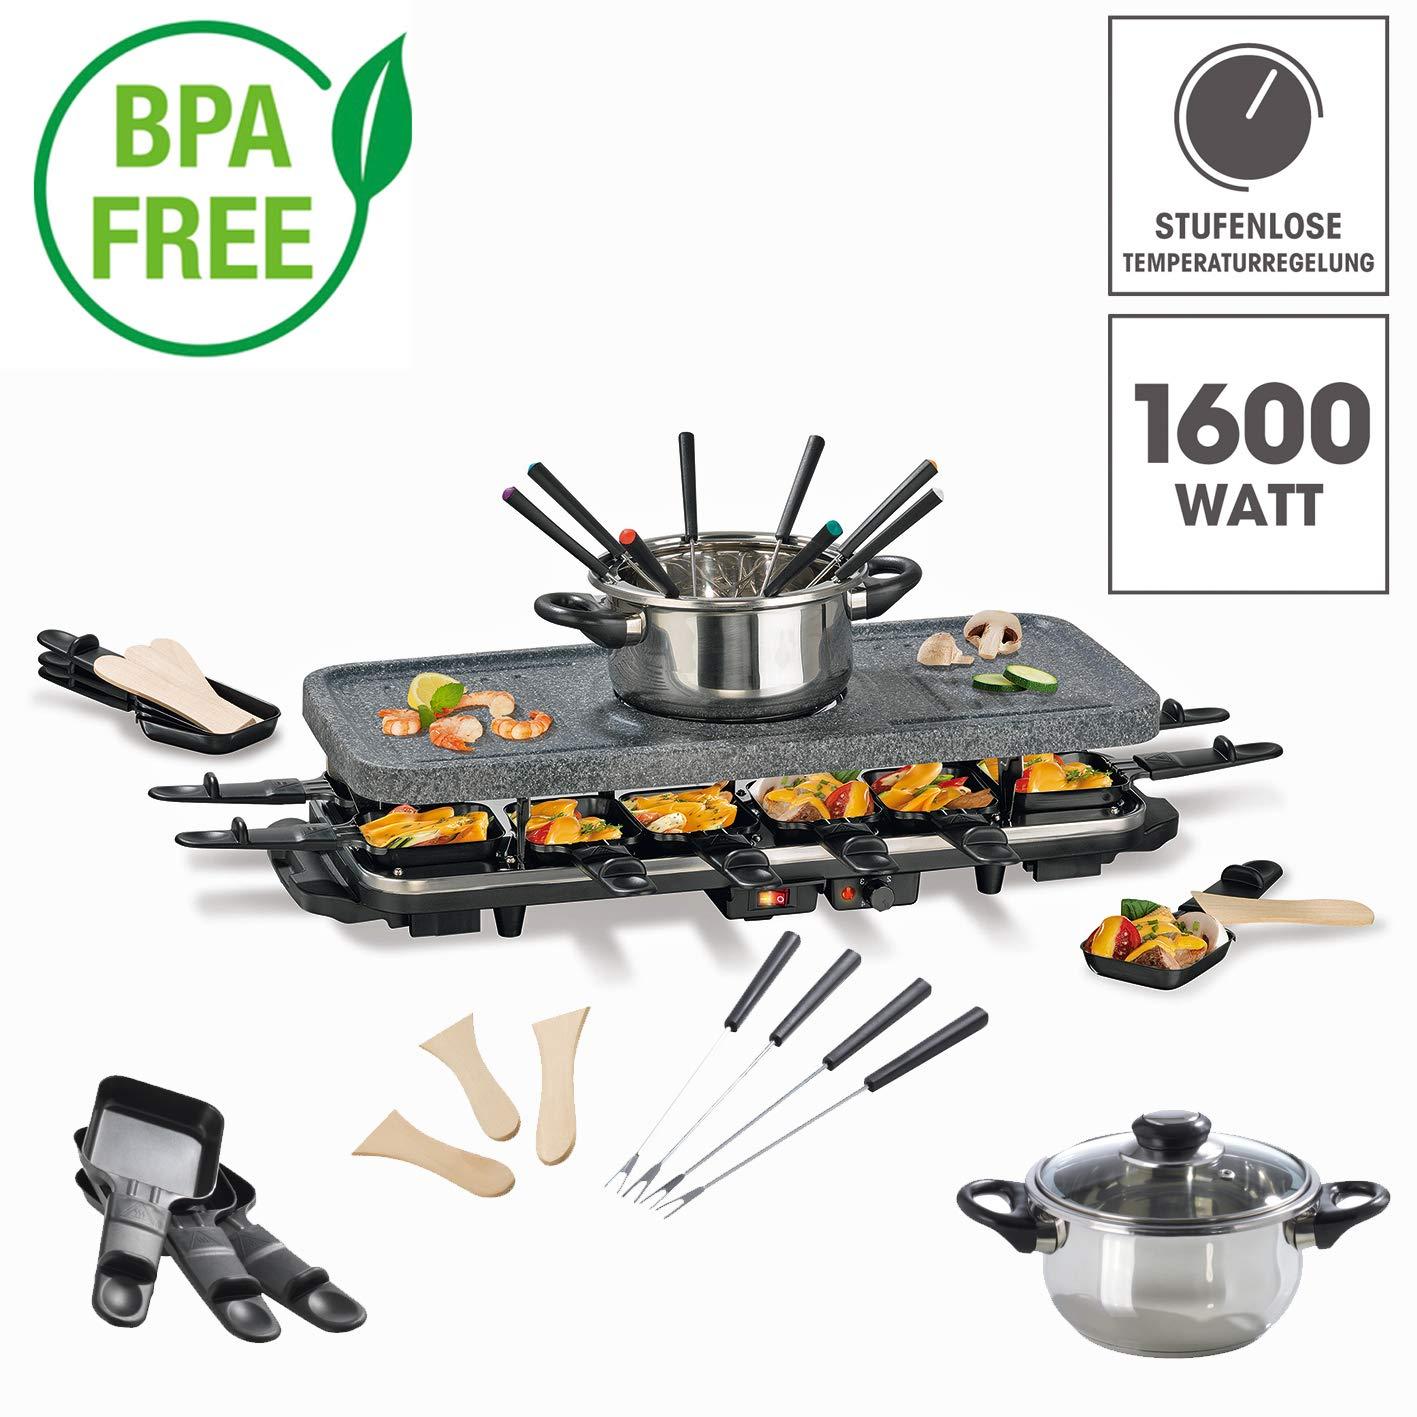 Set per raclette e fonduta per 4-6 - 12 persone, 1600 Watt, rivestimento antiaderente in ceramica BPA feie DS Produkte GmbH